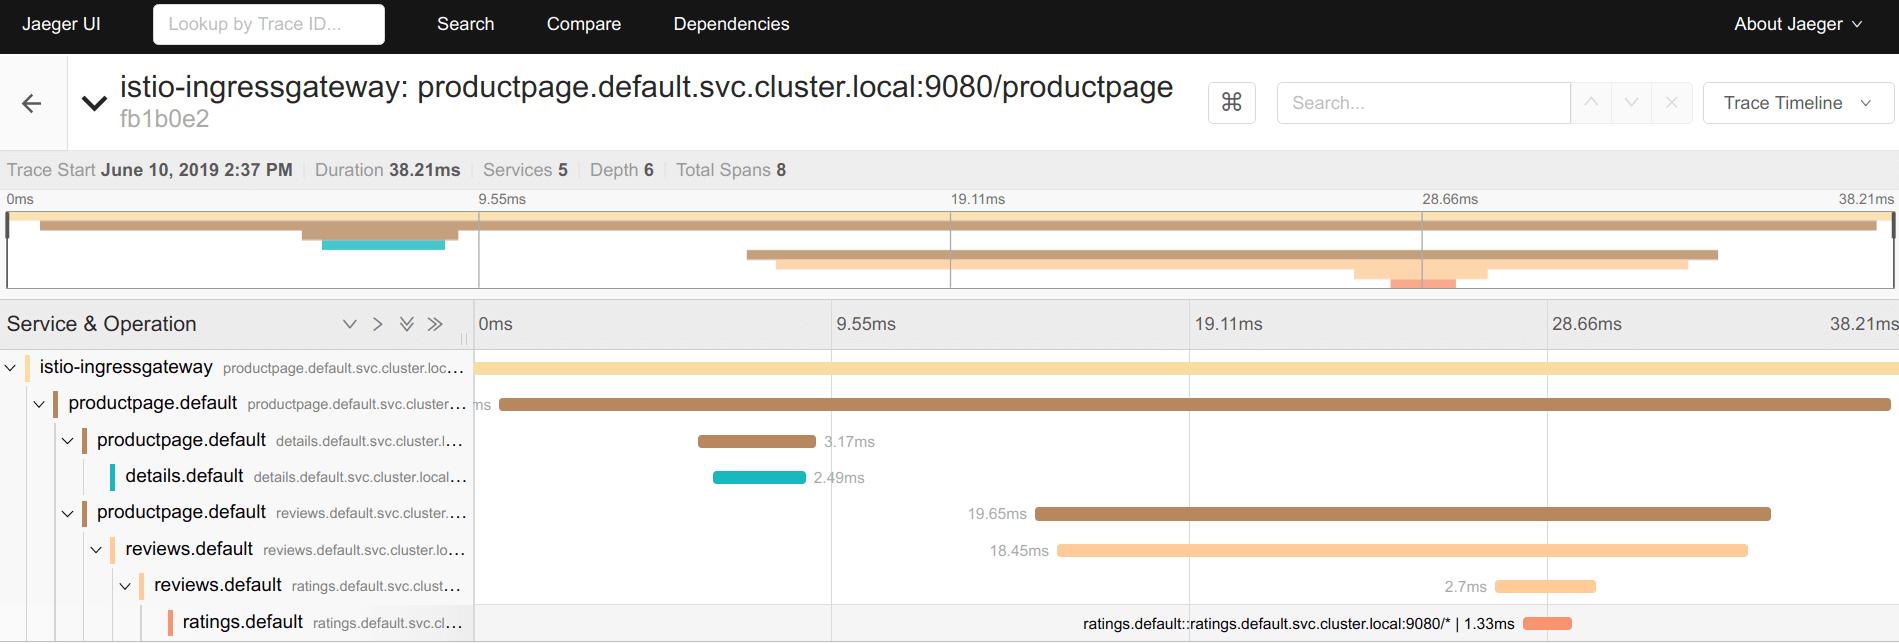 screenshot from Istio Jaeger UI